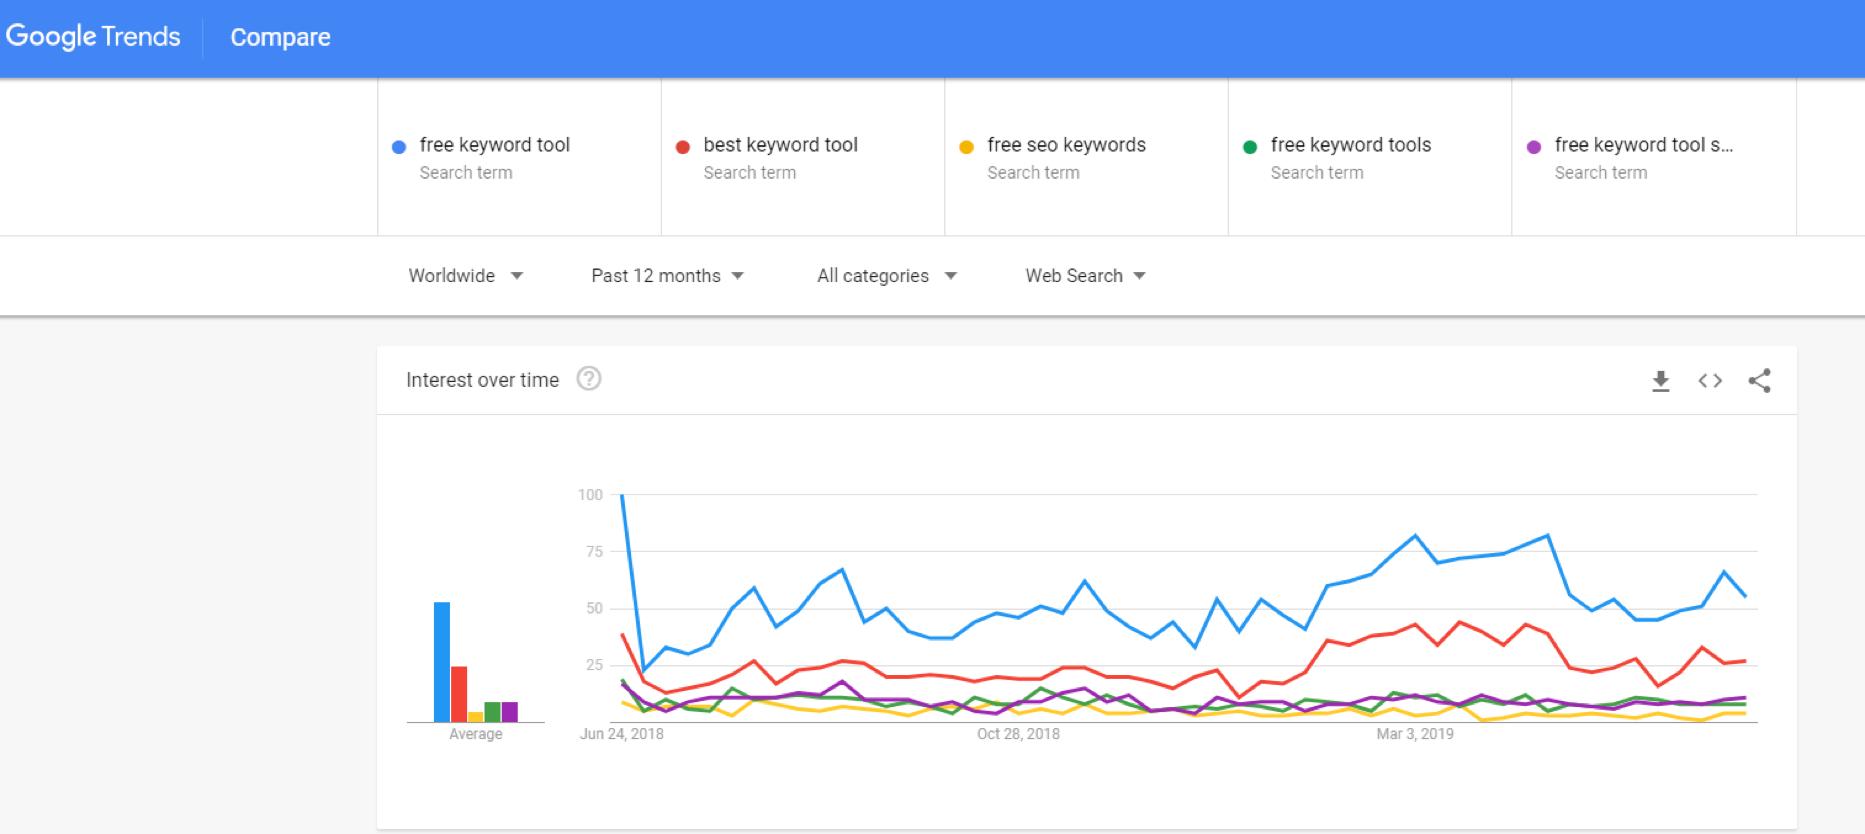 Wesley Clover - Free Keyword Tools - Google Trends